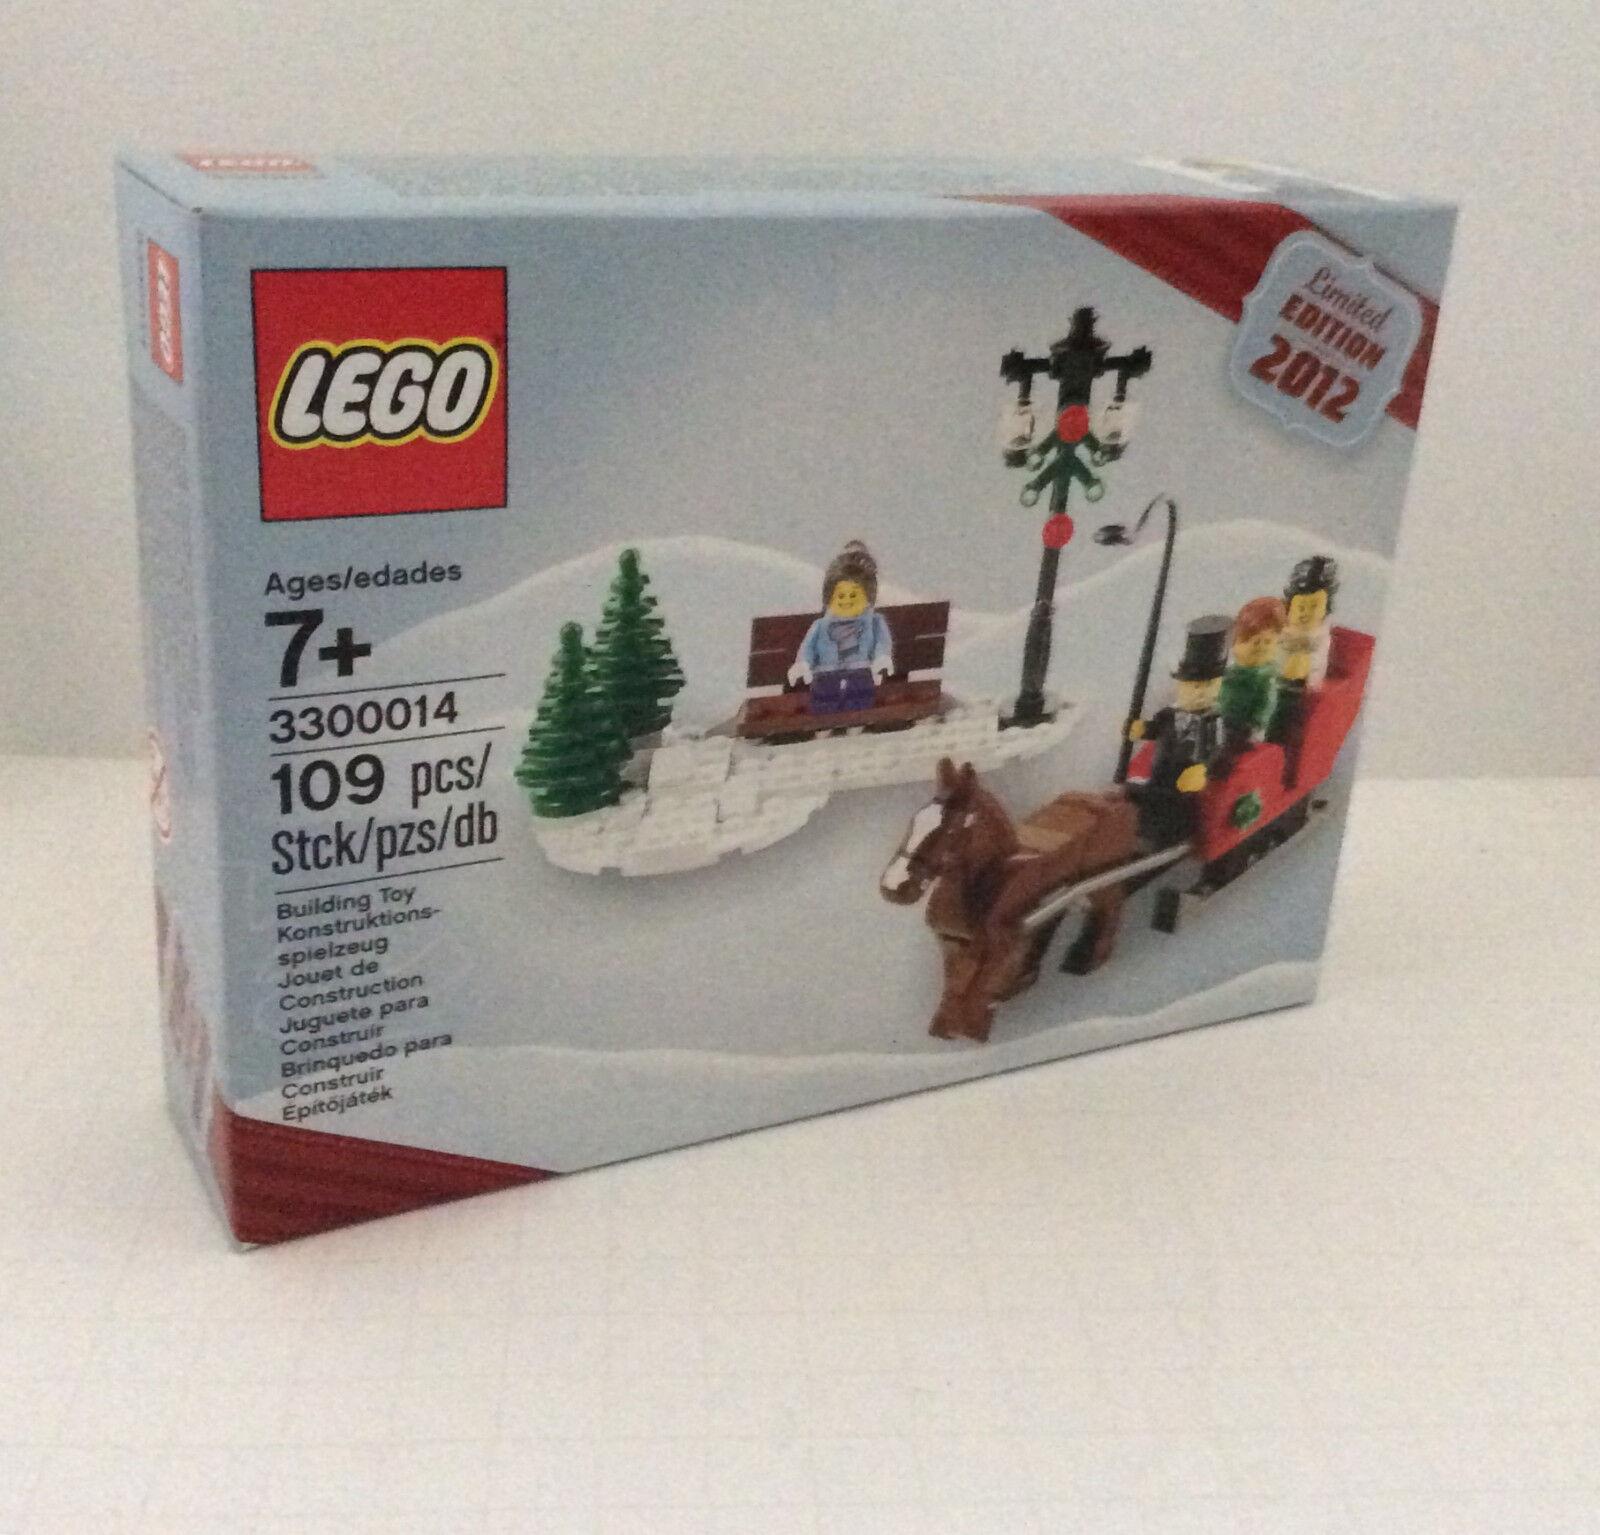 New LEGO 3300014  2012 Limited Edition Christmas Holiday Set  Factory Sealed